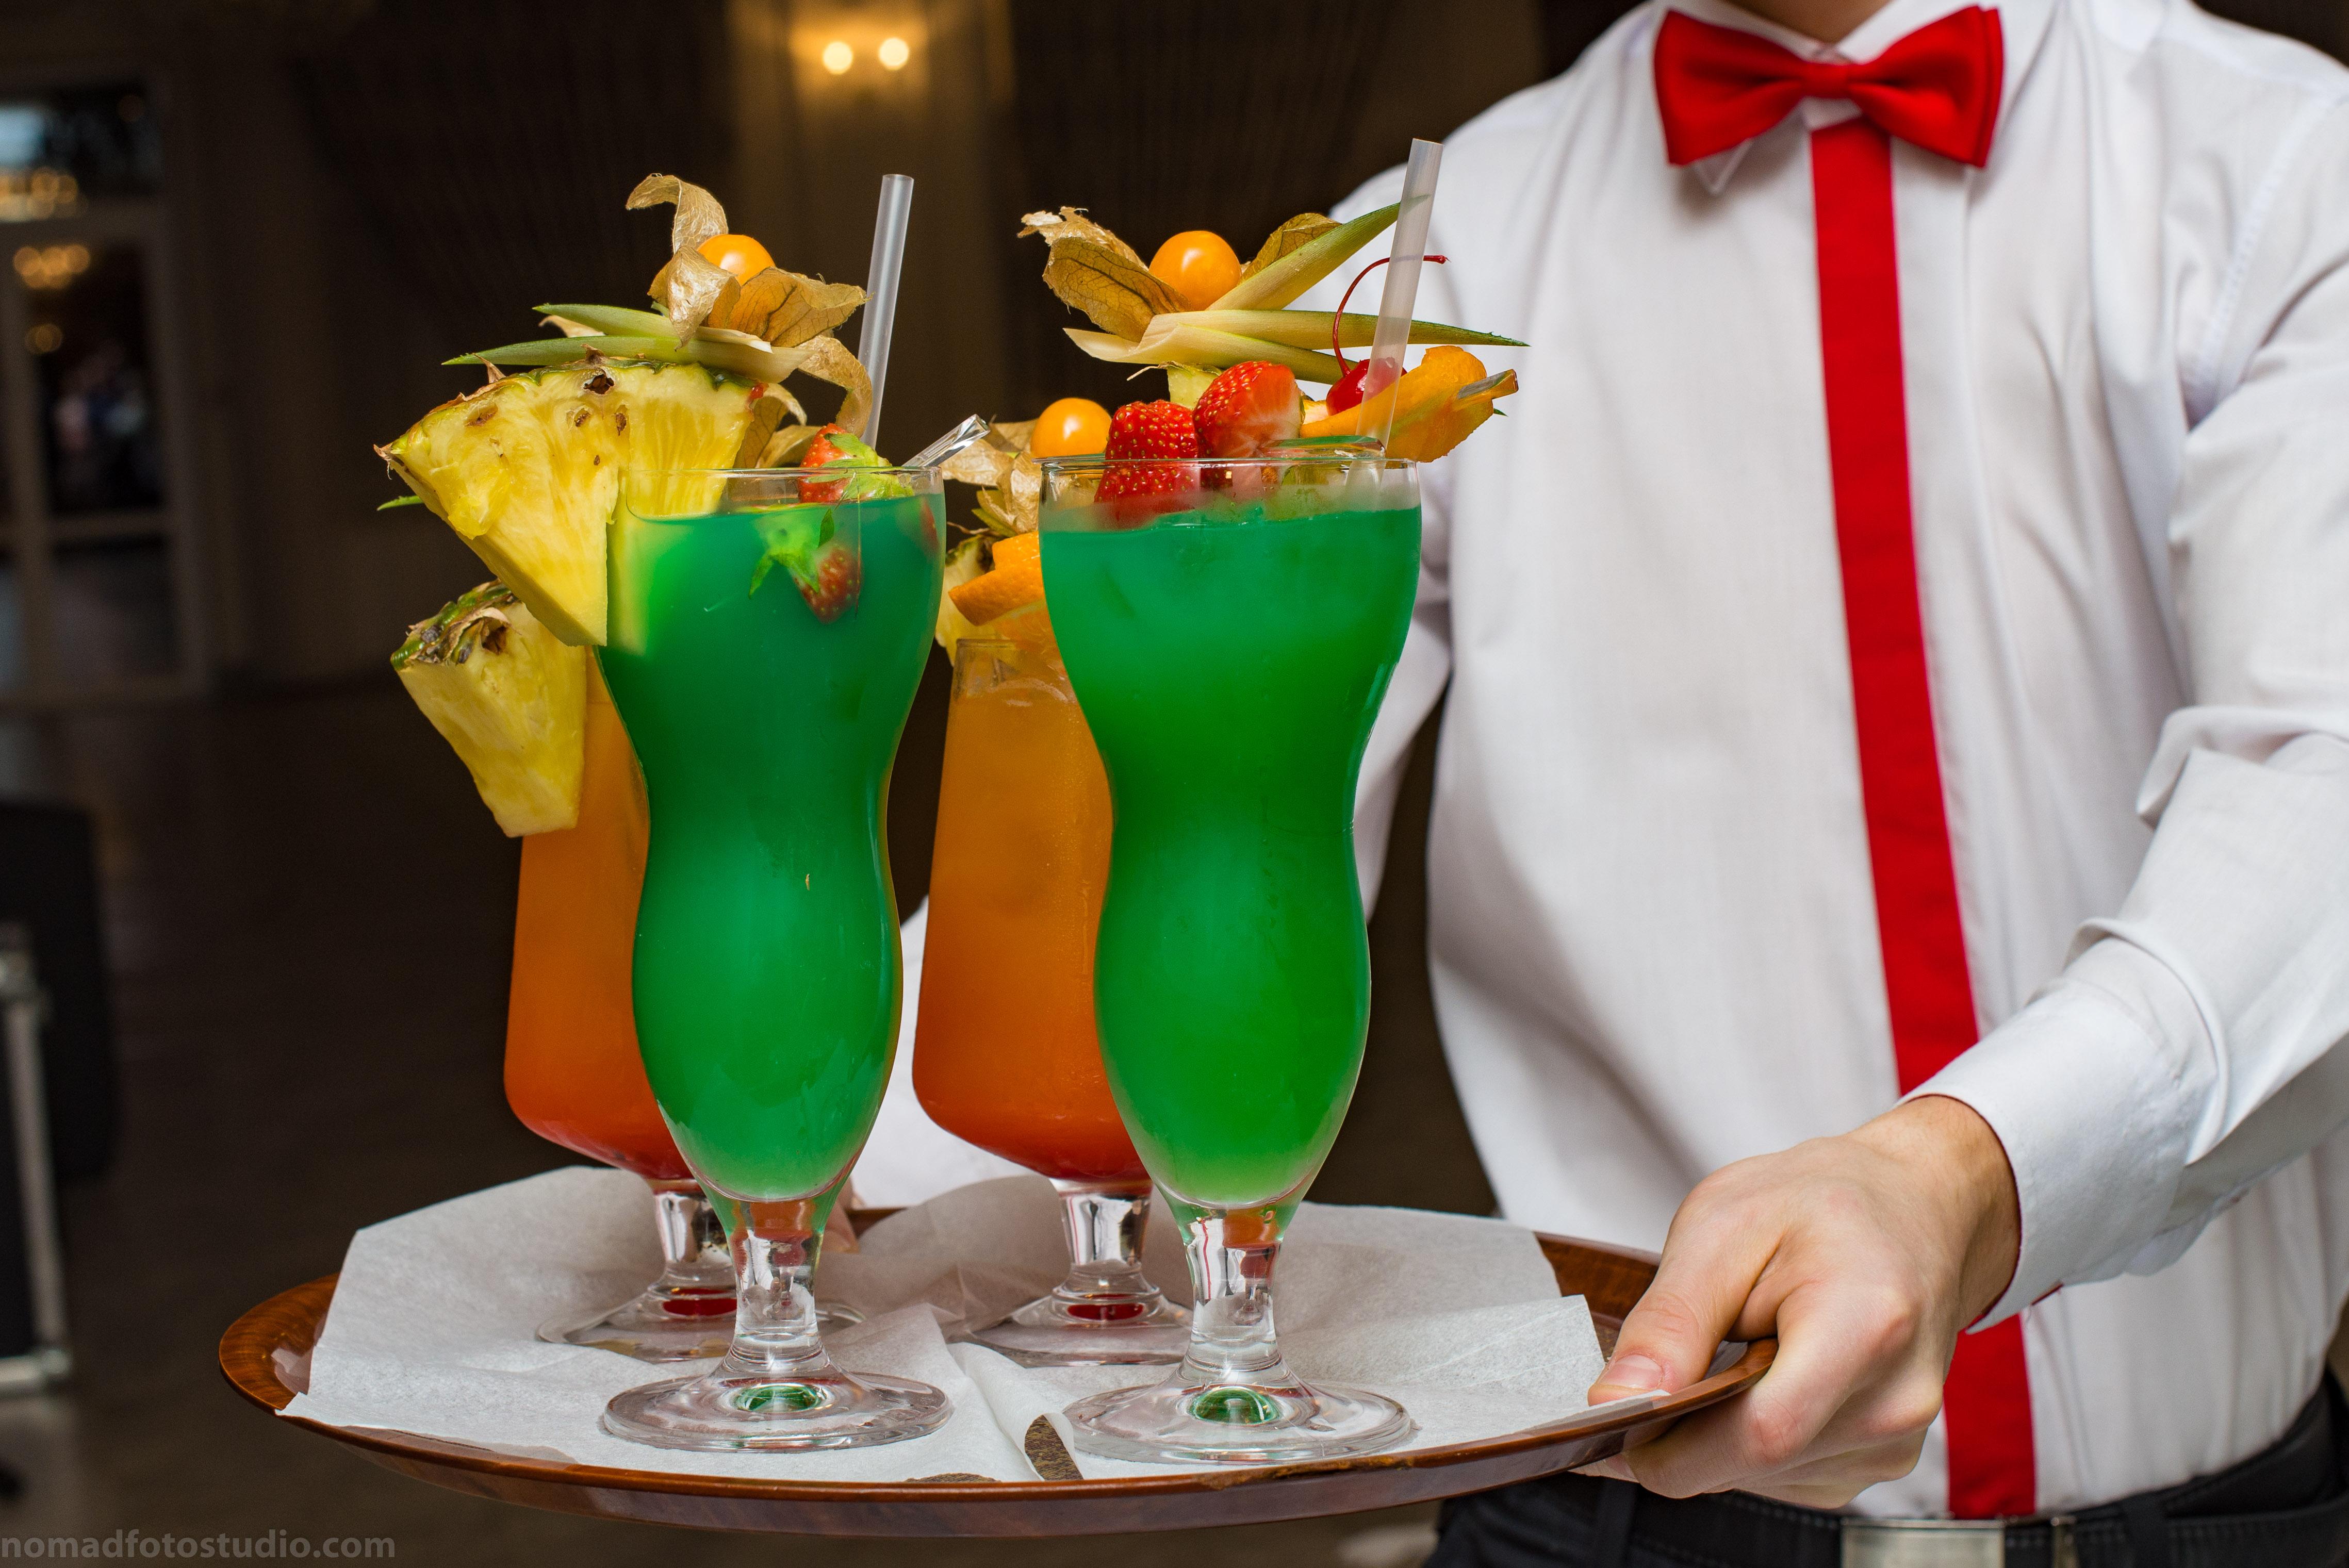 Siedlce-drink-bar-mobilny-barman-na-wesele-evet-agencja-barmańska-drinki-17